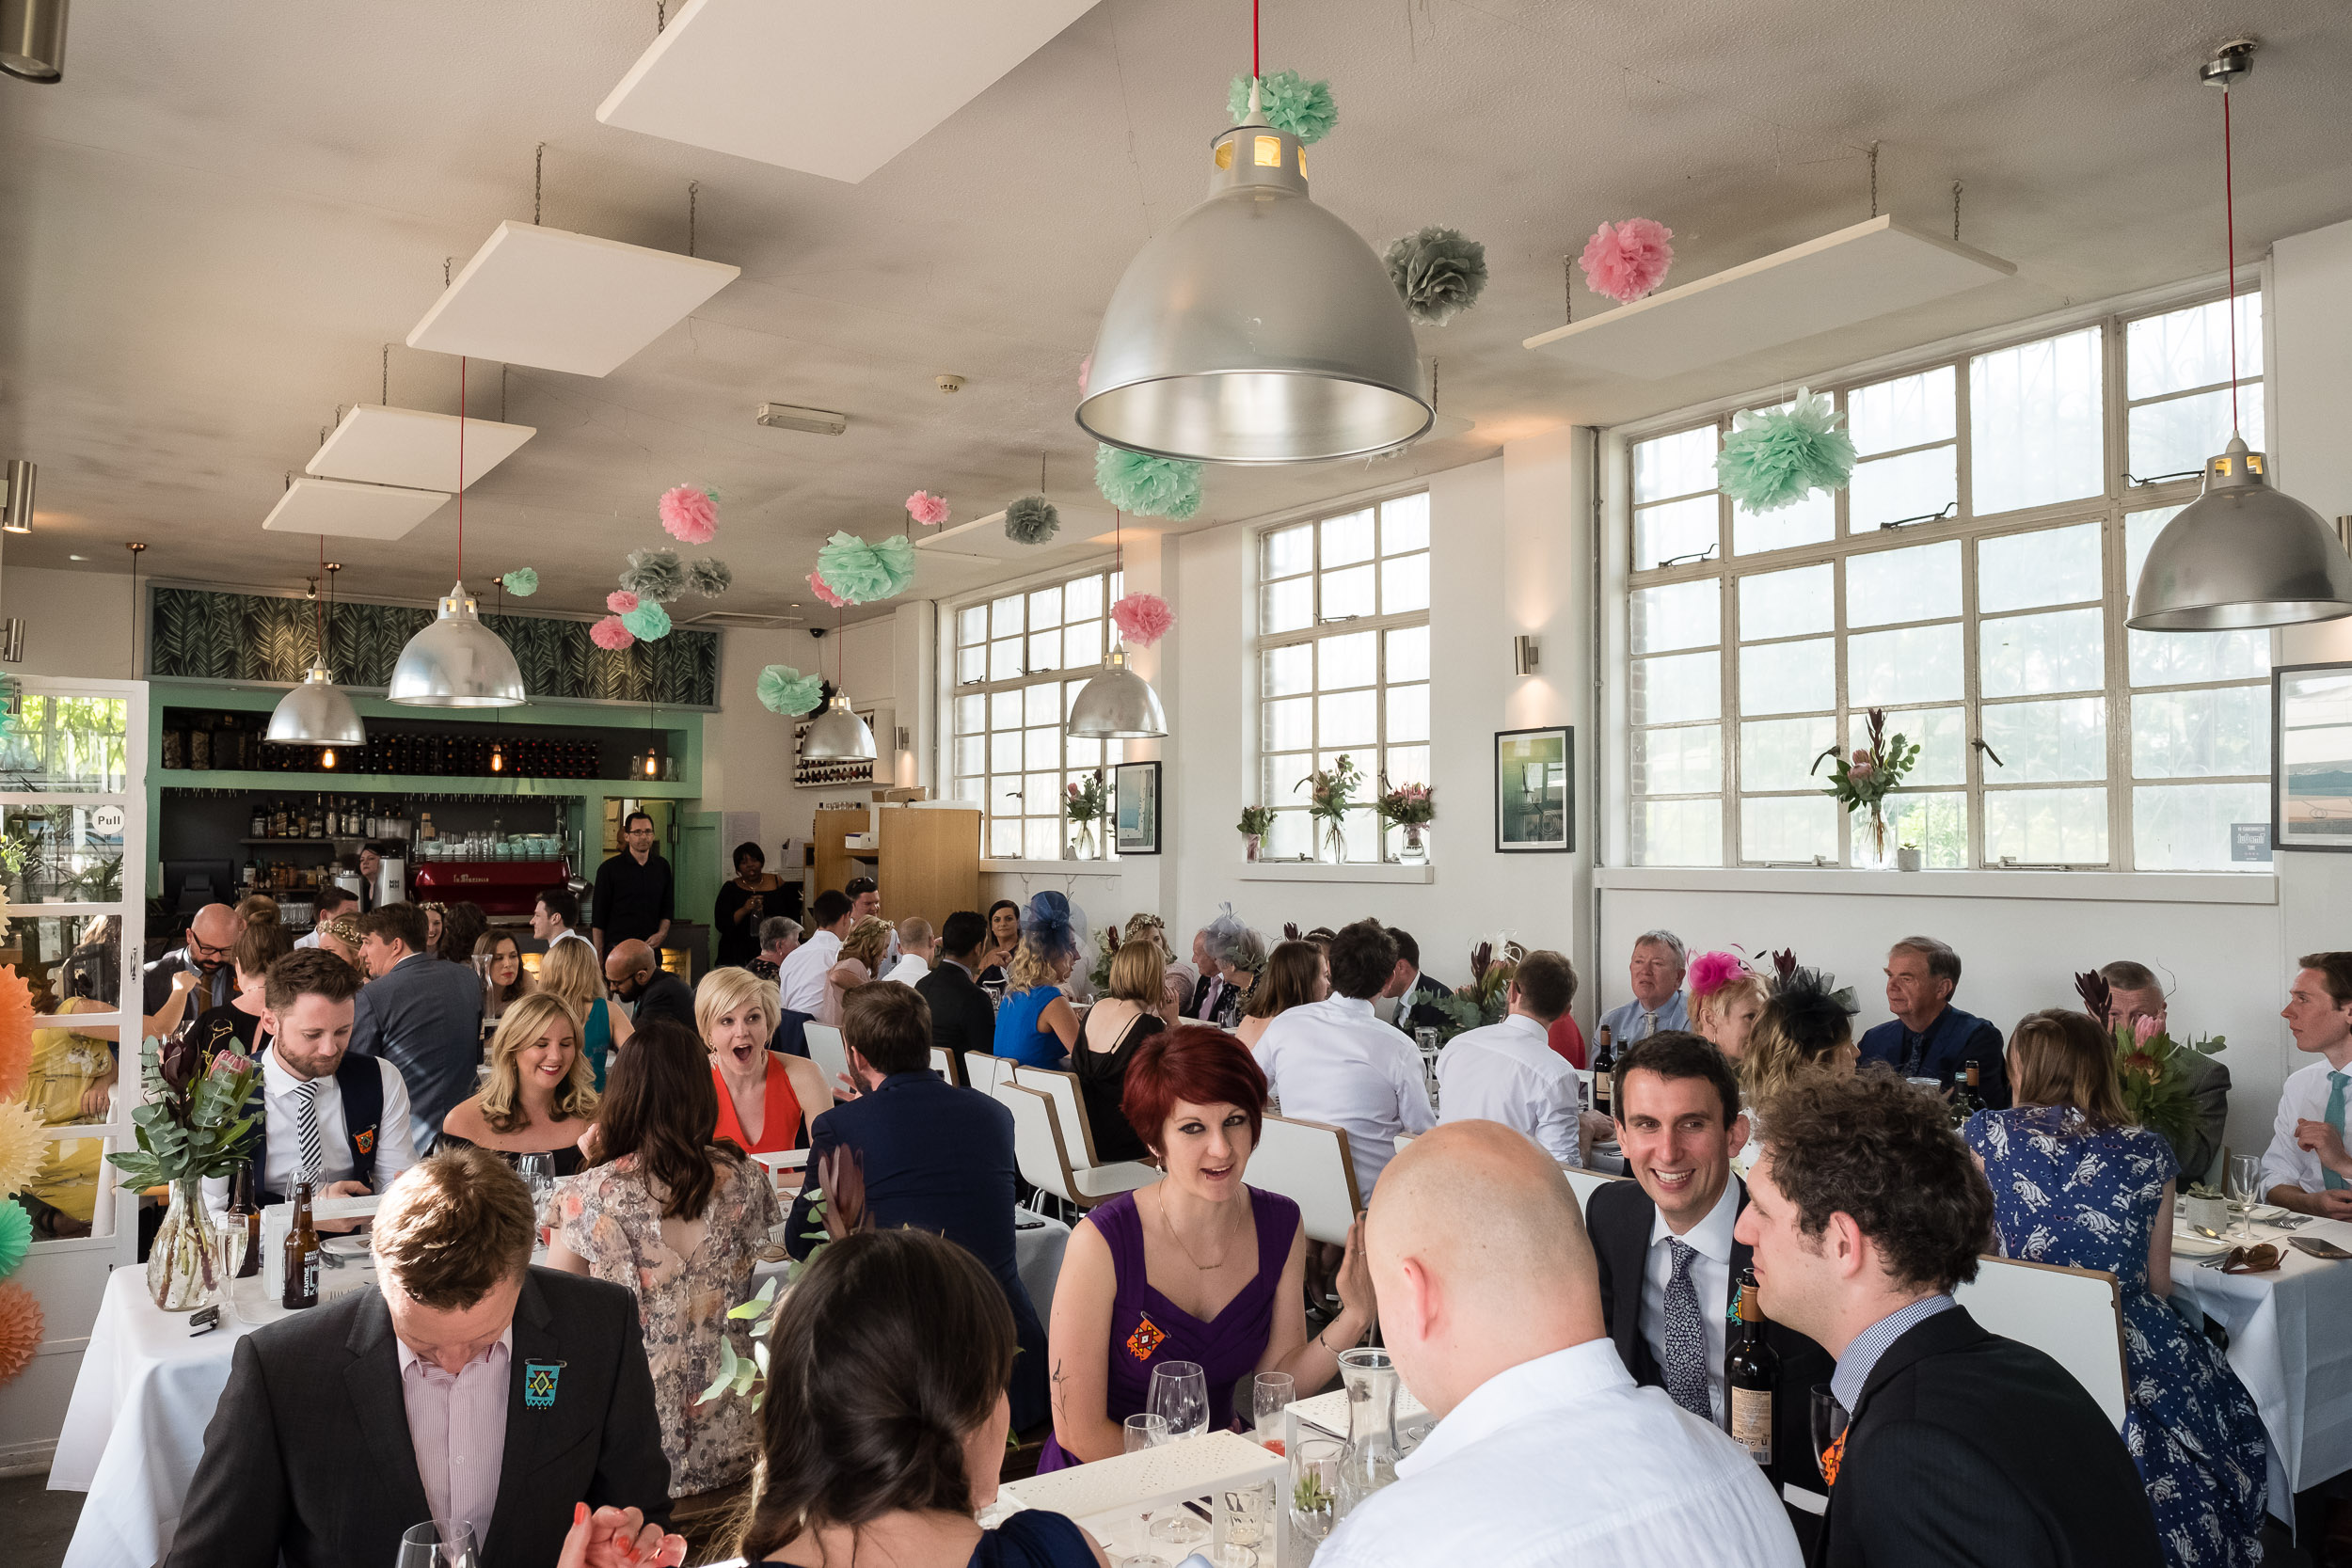 brockwell-lido-brixton-herne-hill-wedding-308.jpg